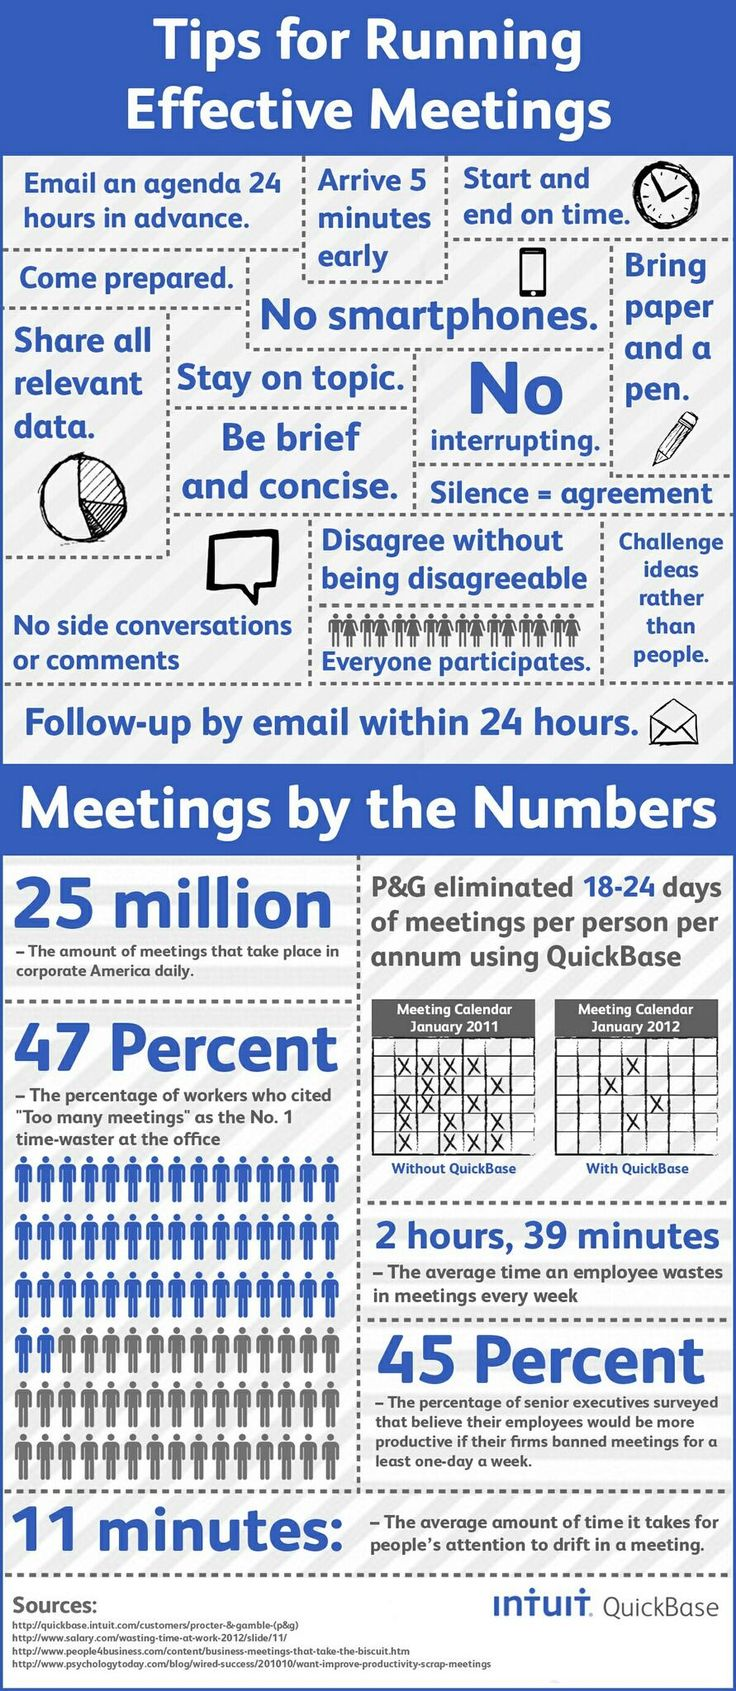 Tips for running effective meetings: Twitter / TheMarketingSoc